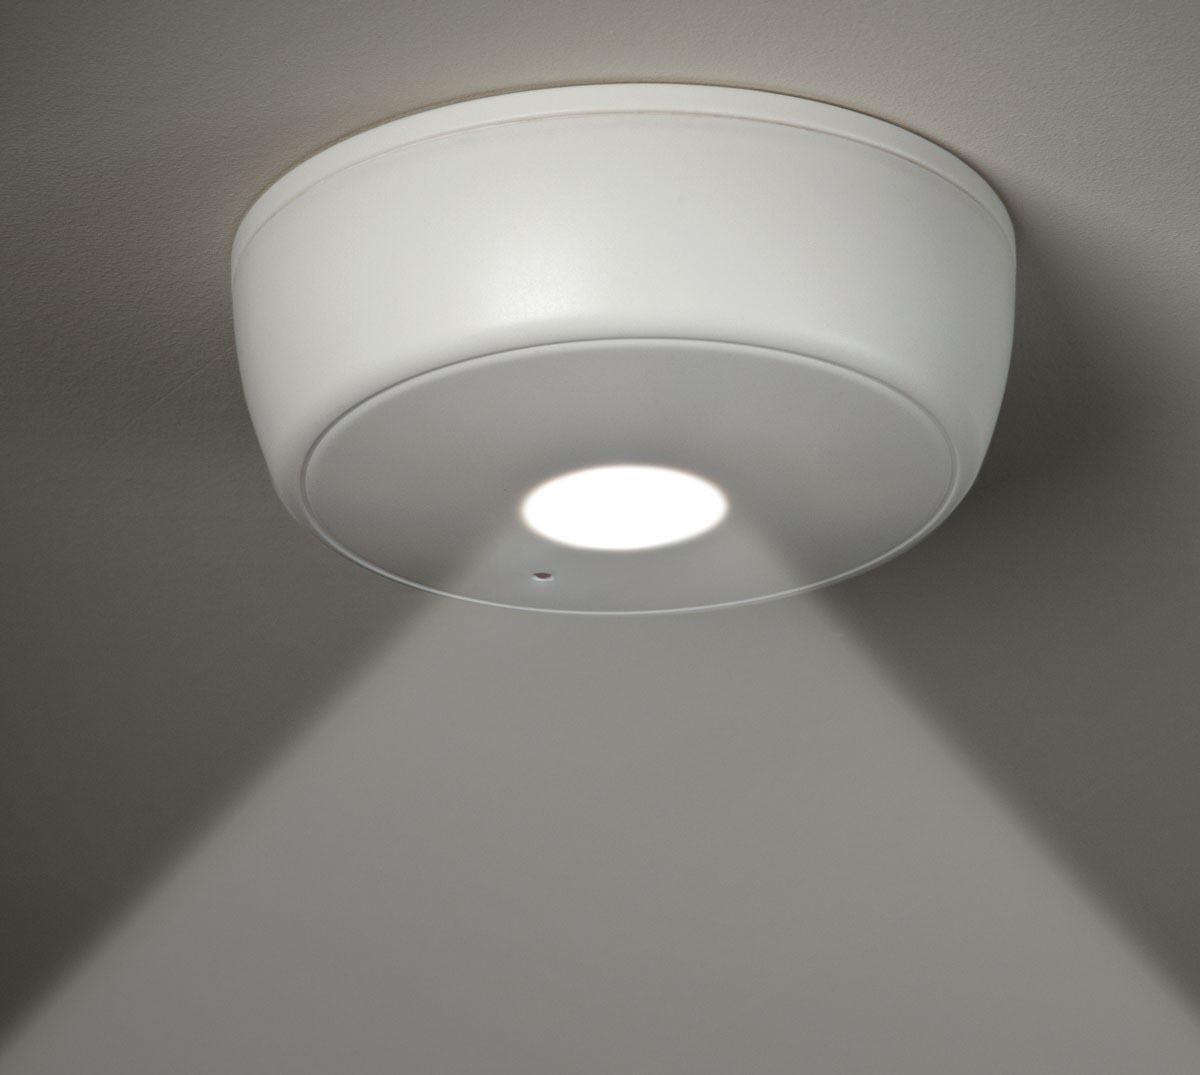 Cordless Ceiling Light 10 Tips For Buying Warisan Lighting